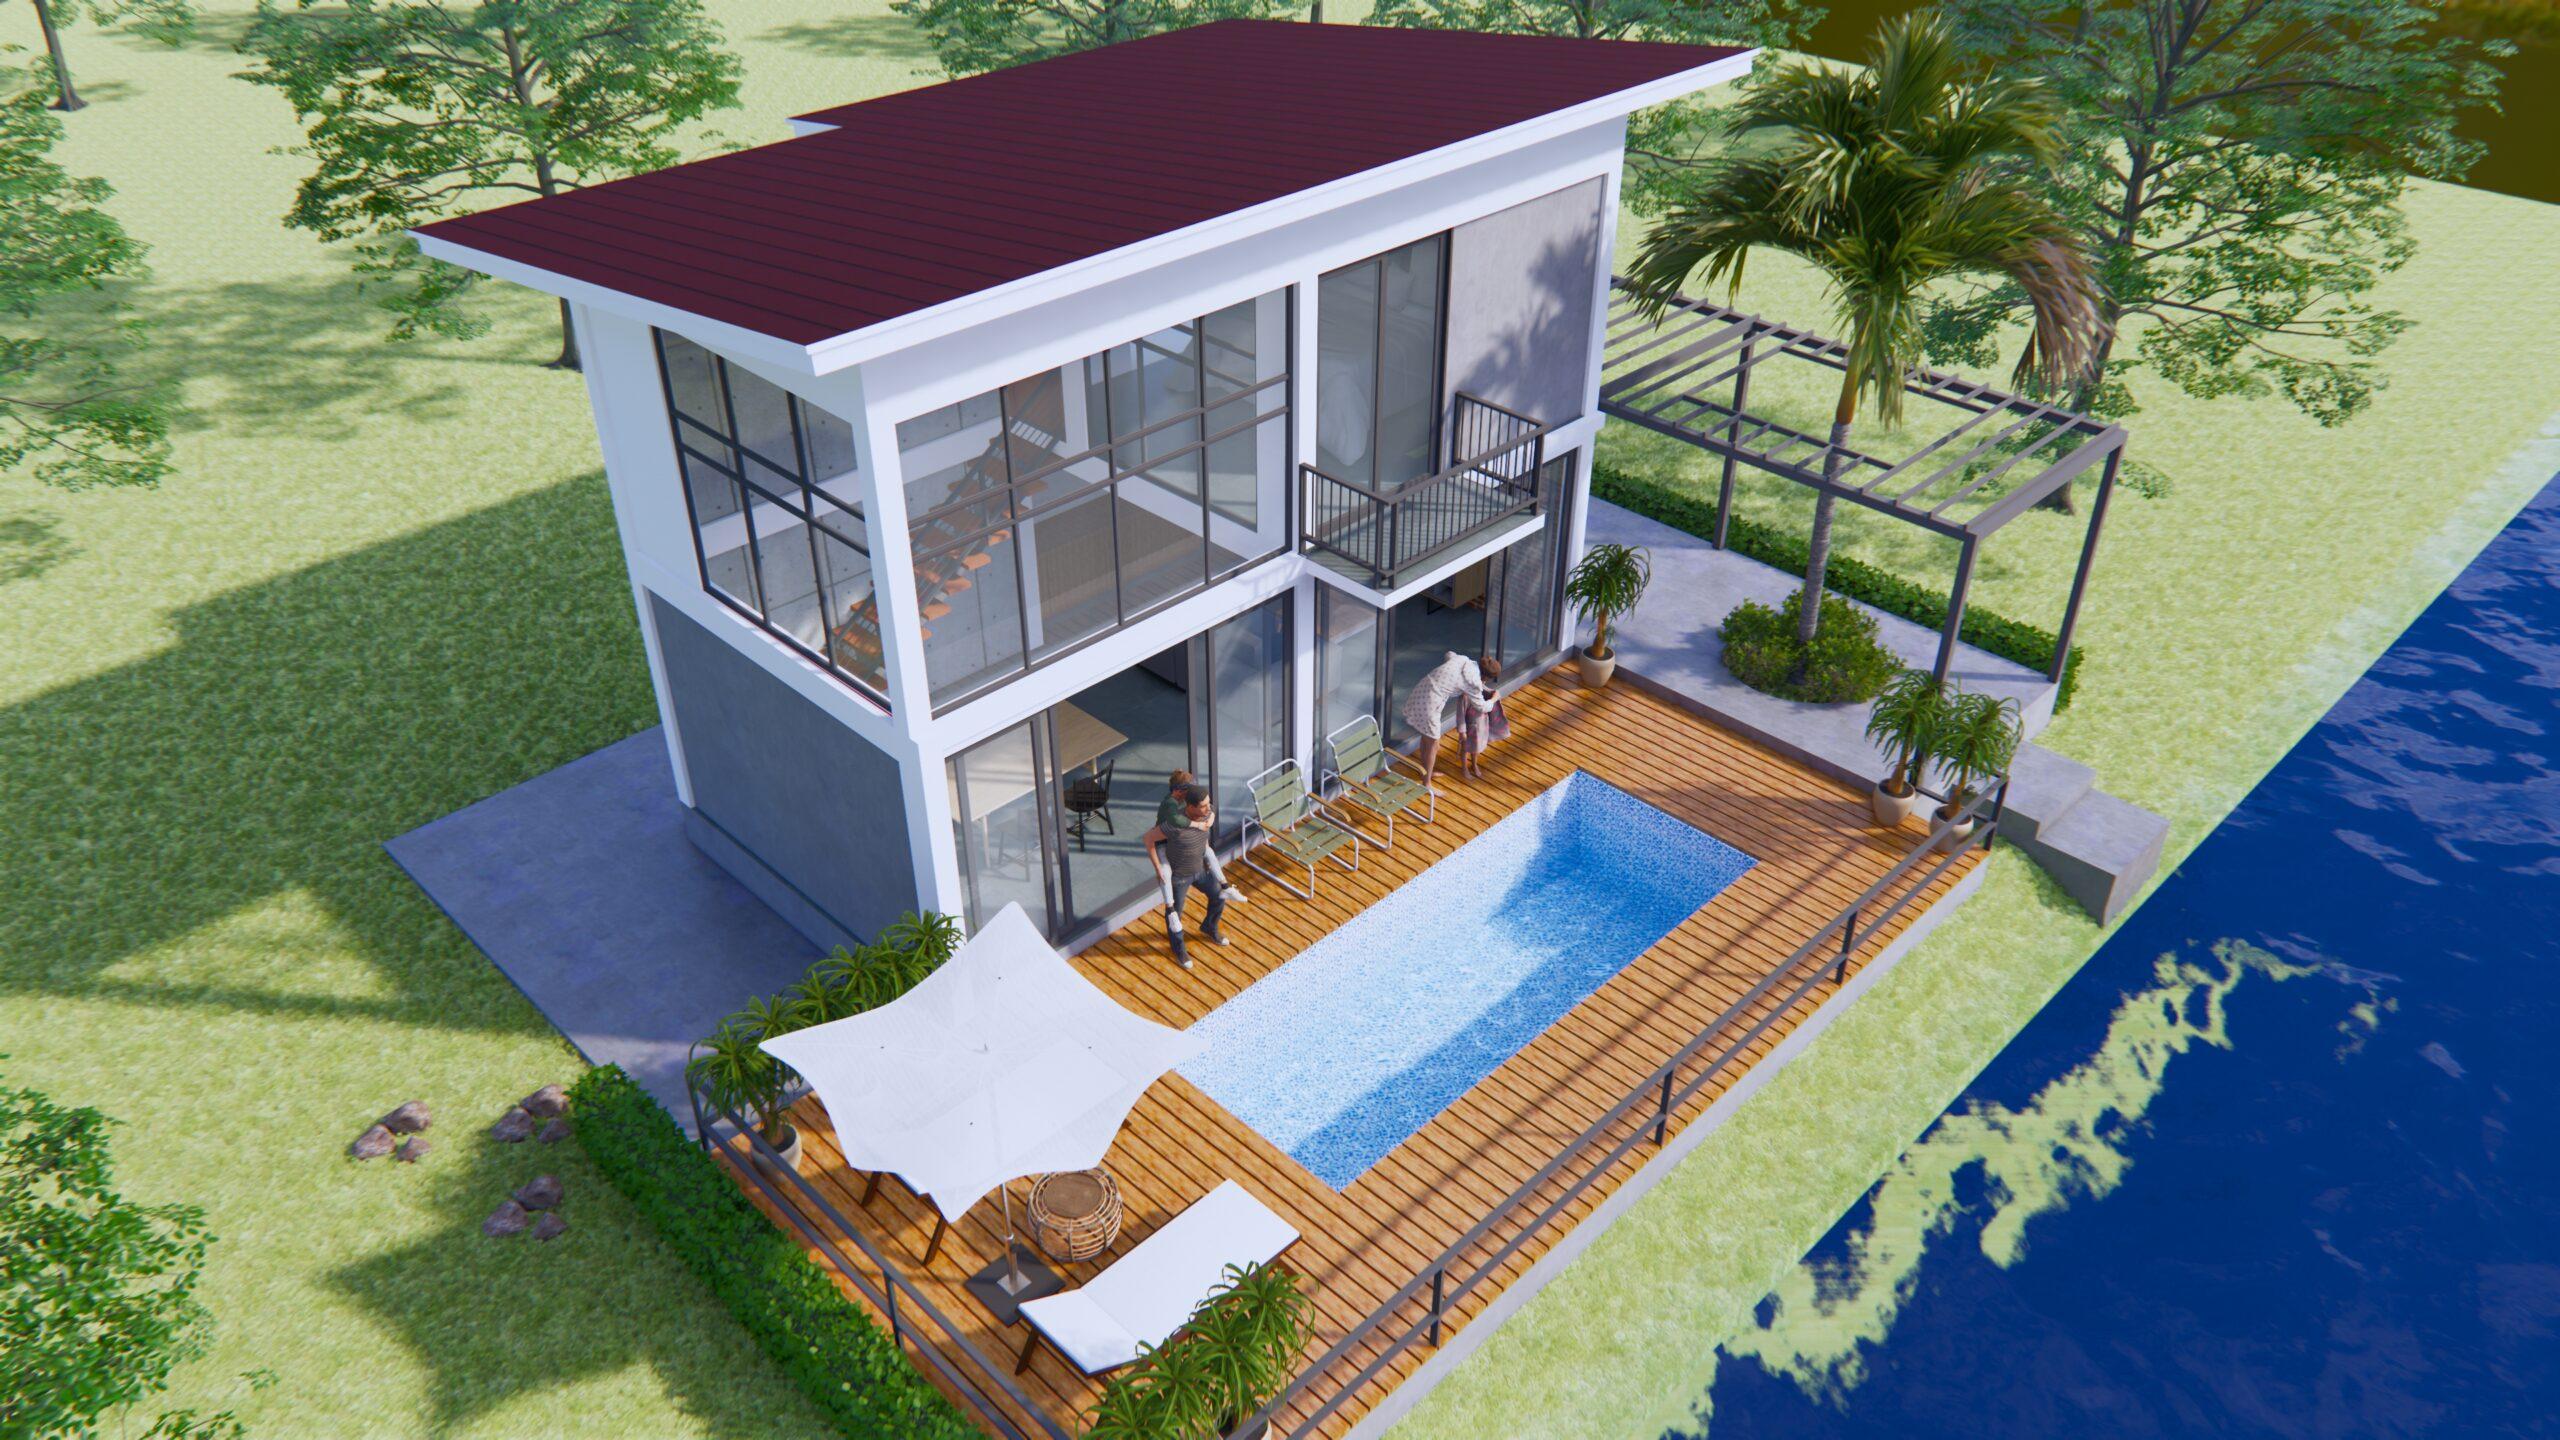 Lake House Plans 13x11 Meter 44x36 Feet 8